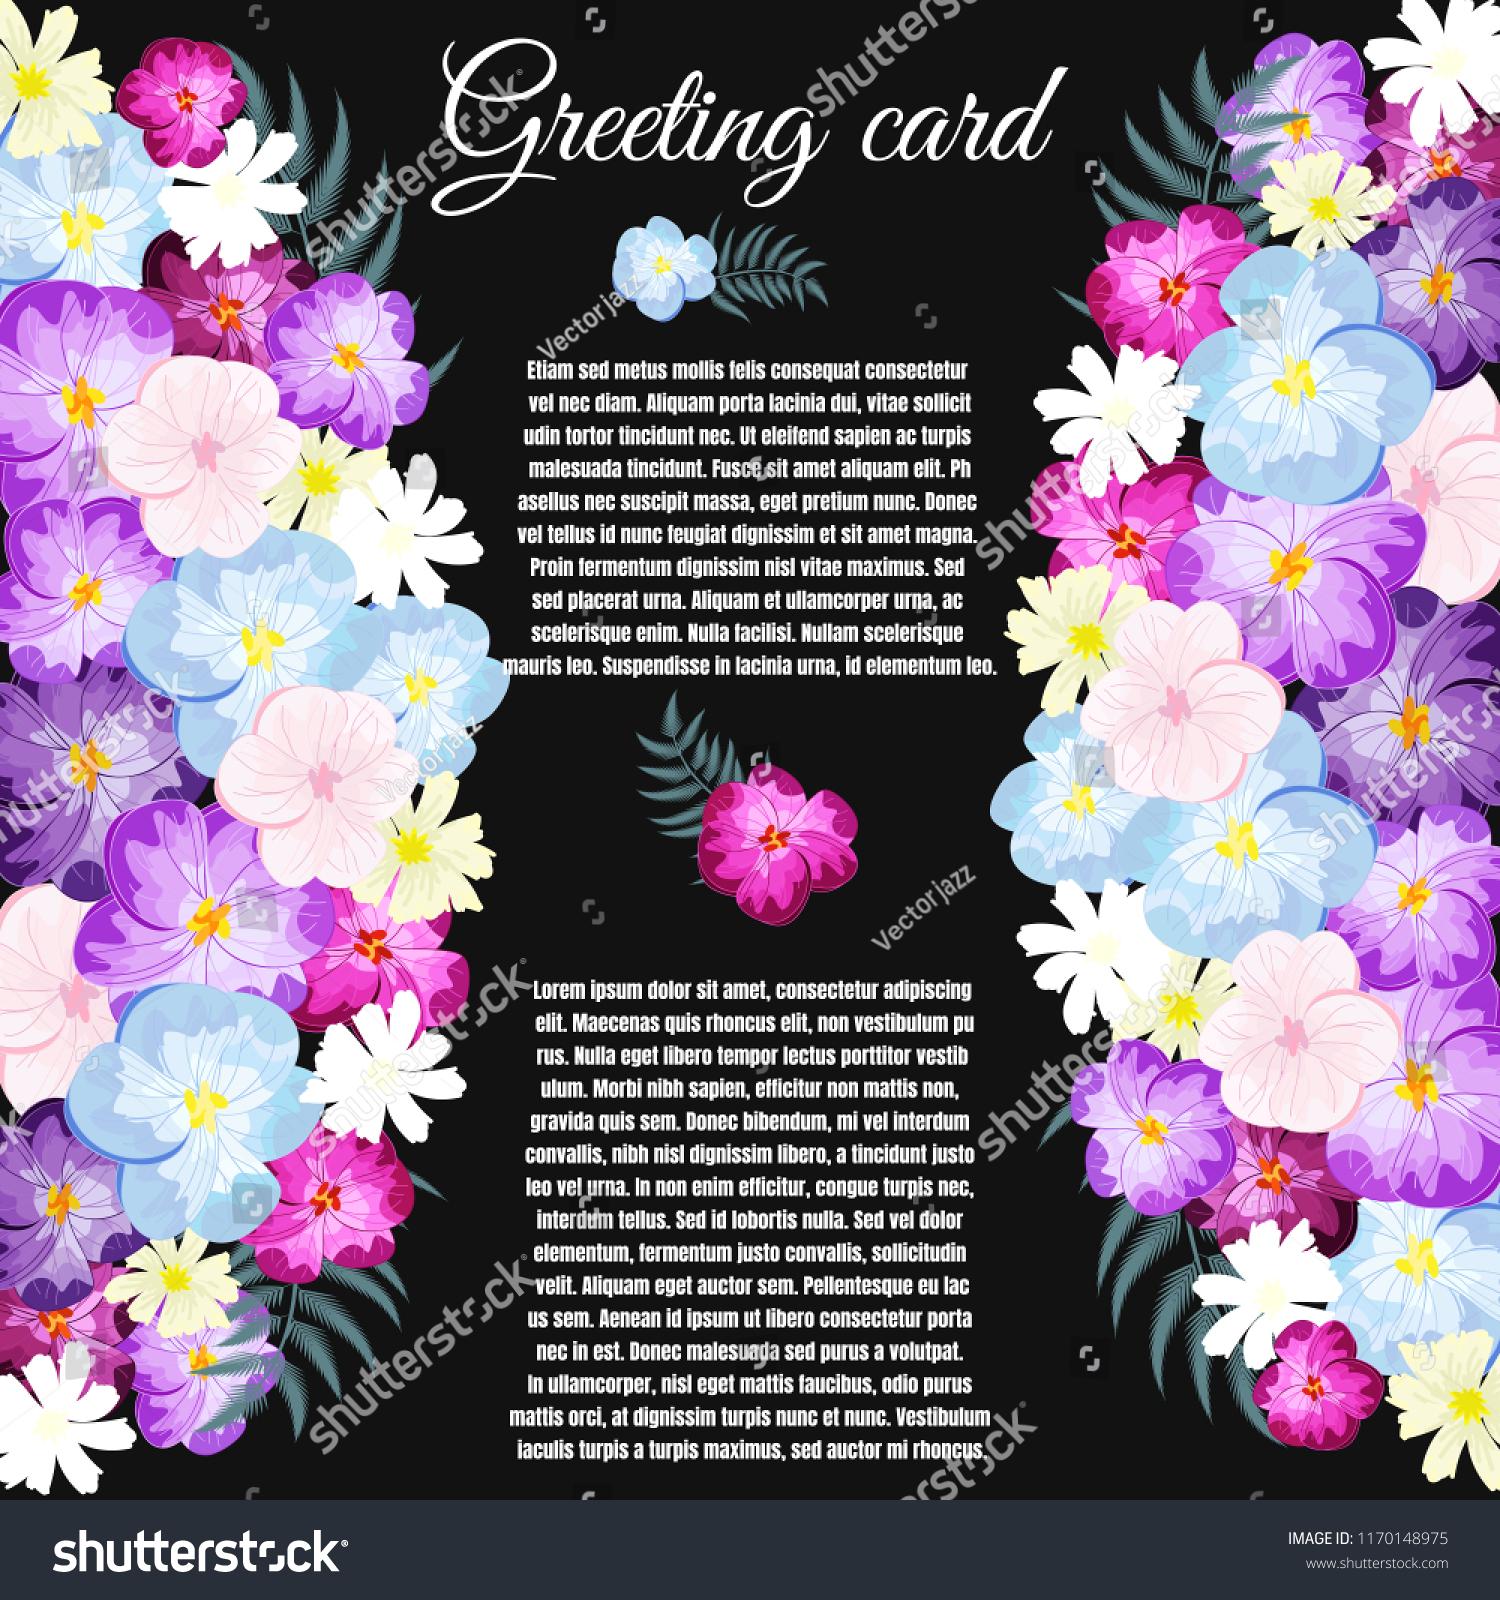 Greeting card floral wedding felicitation elegant stock vector.